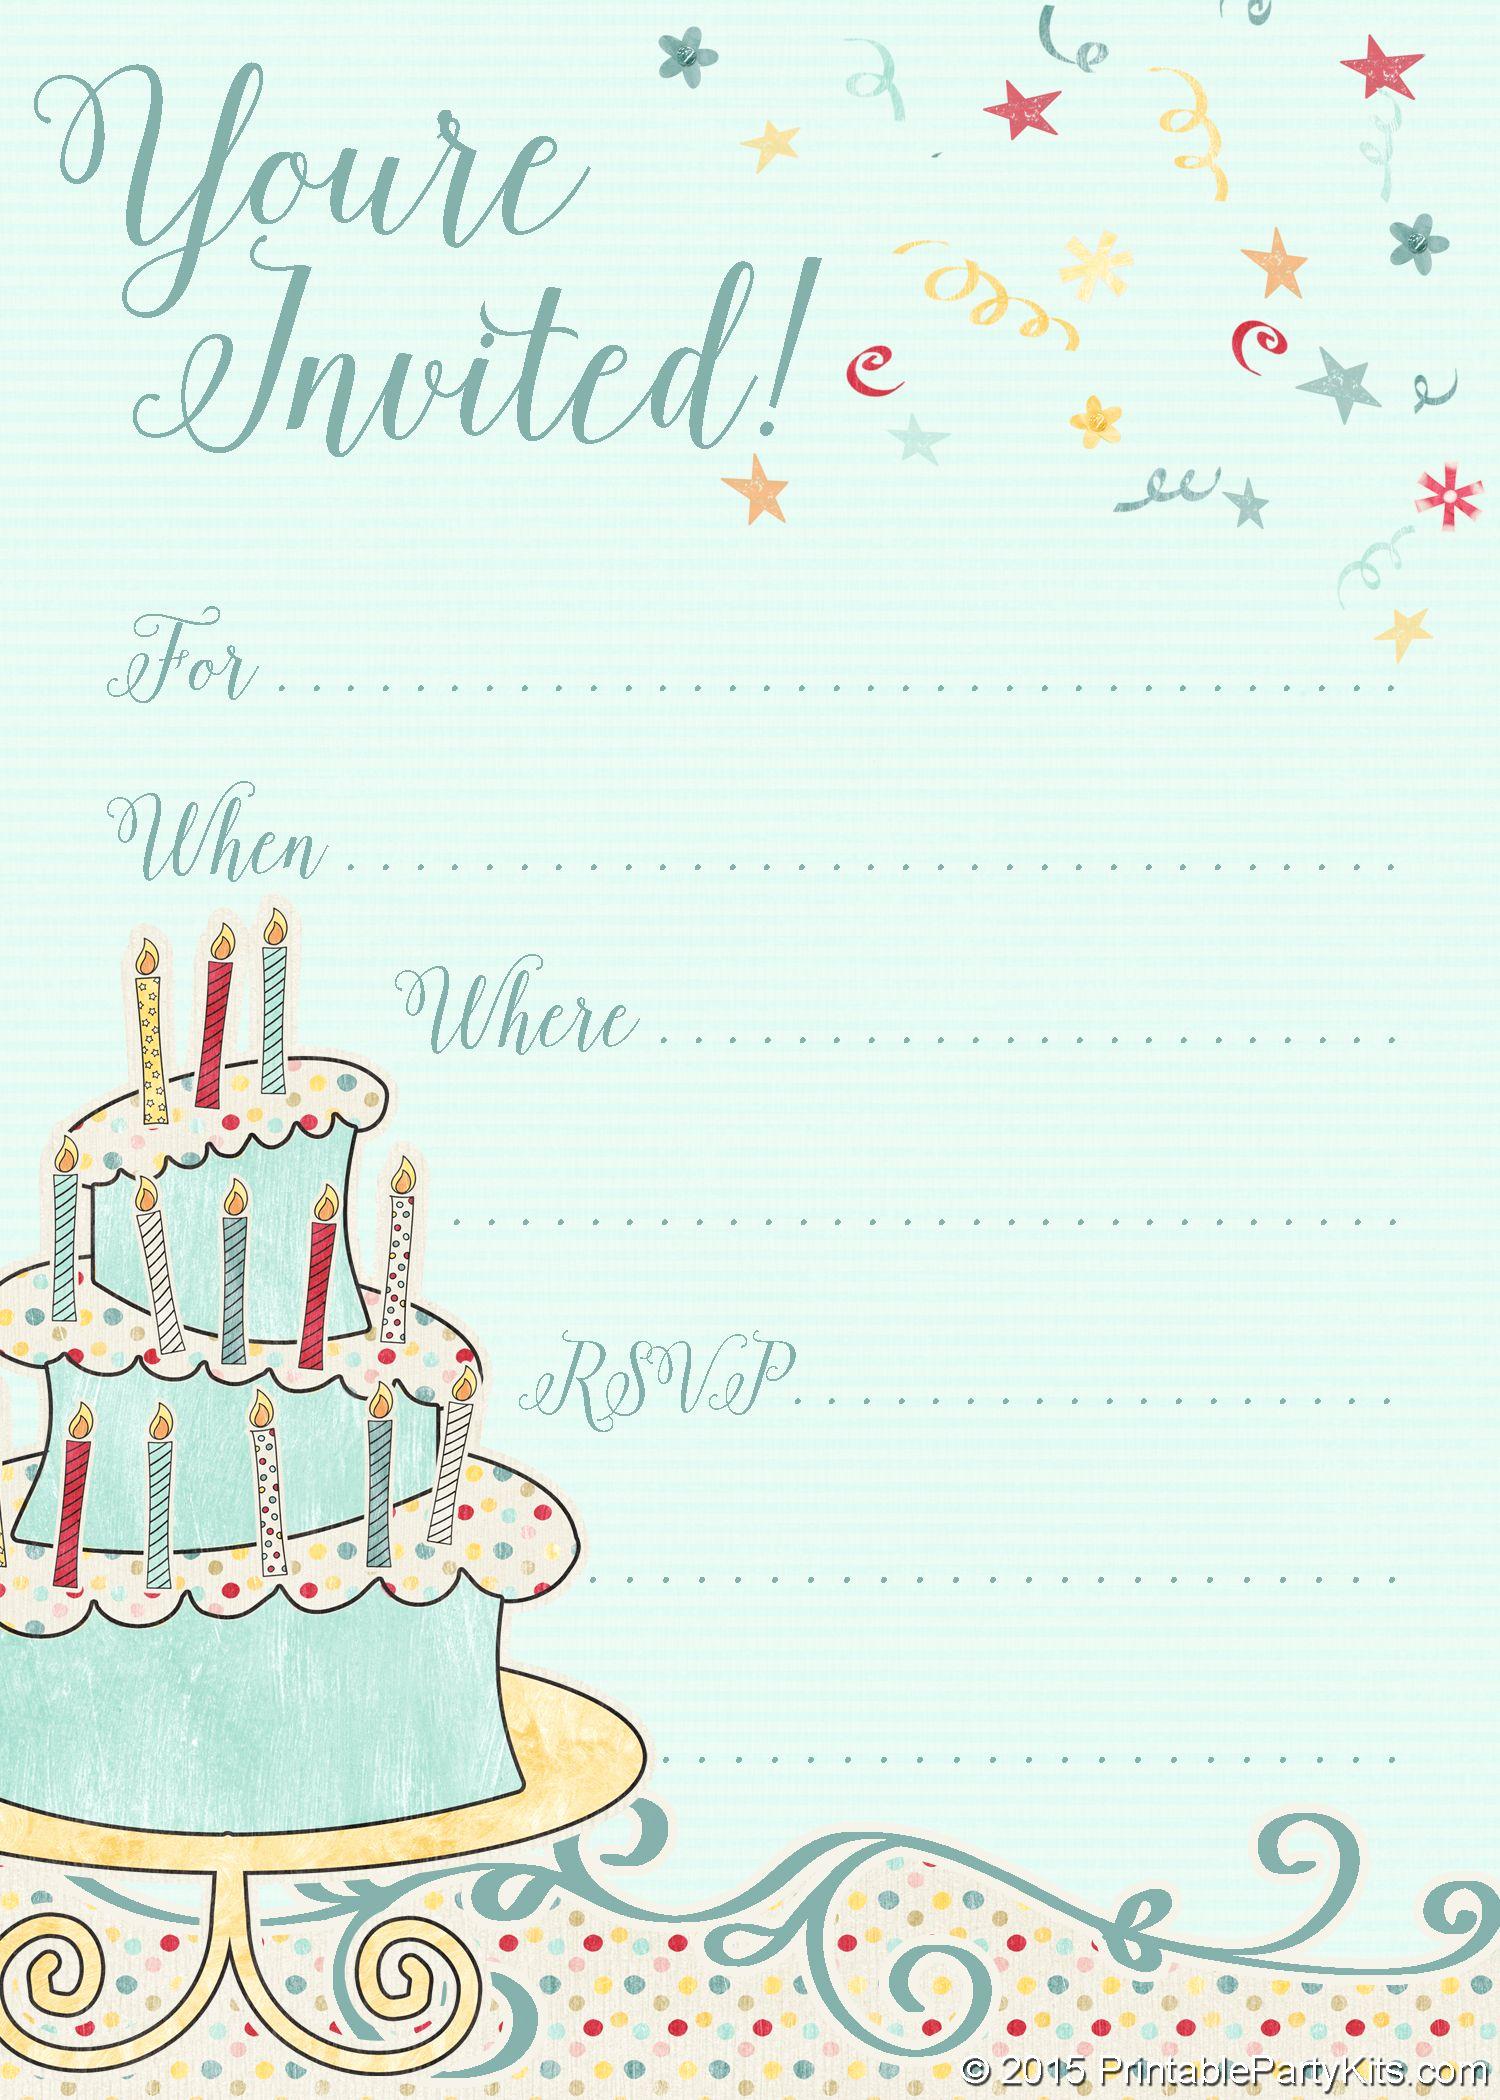 Free Templates for Invitations Elegant Free Printable Whimsical Birthday Party Invitation